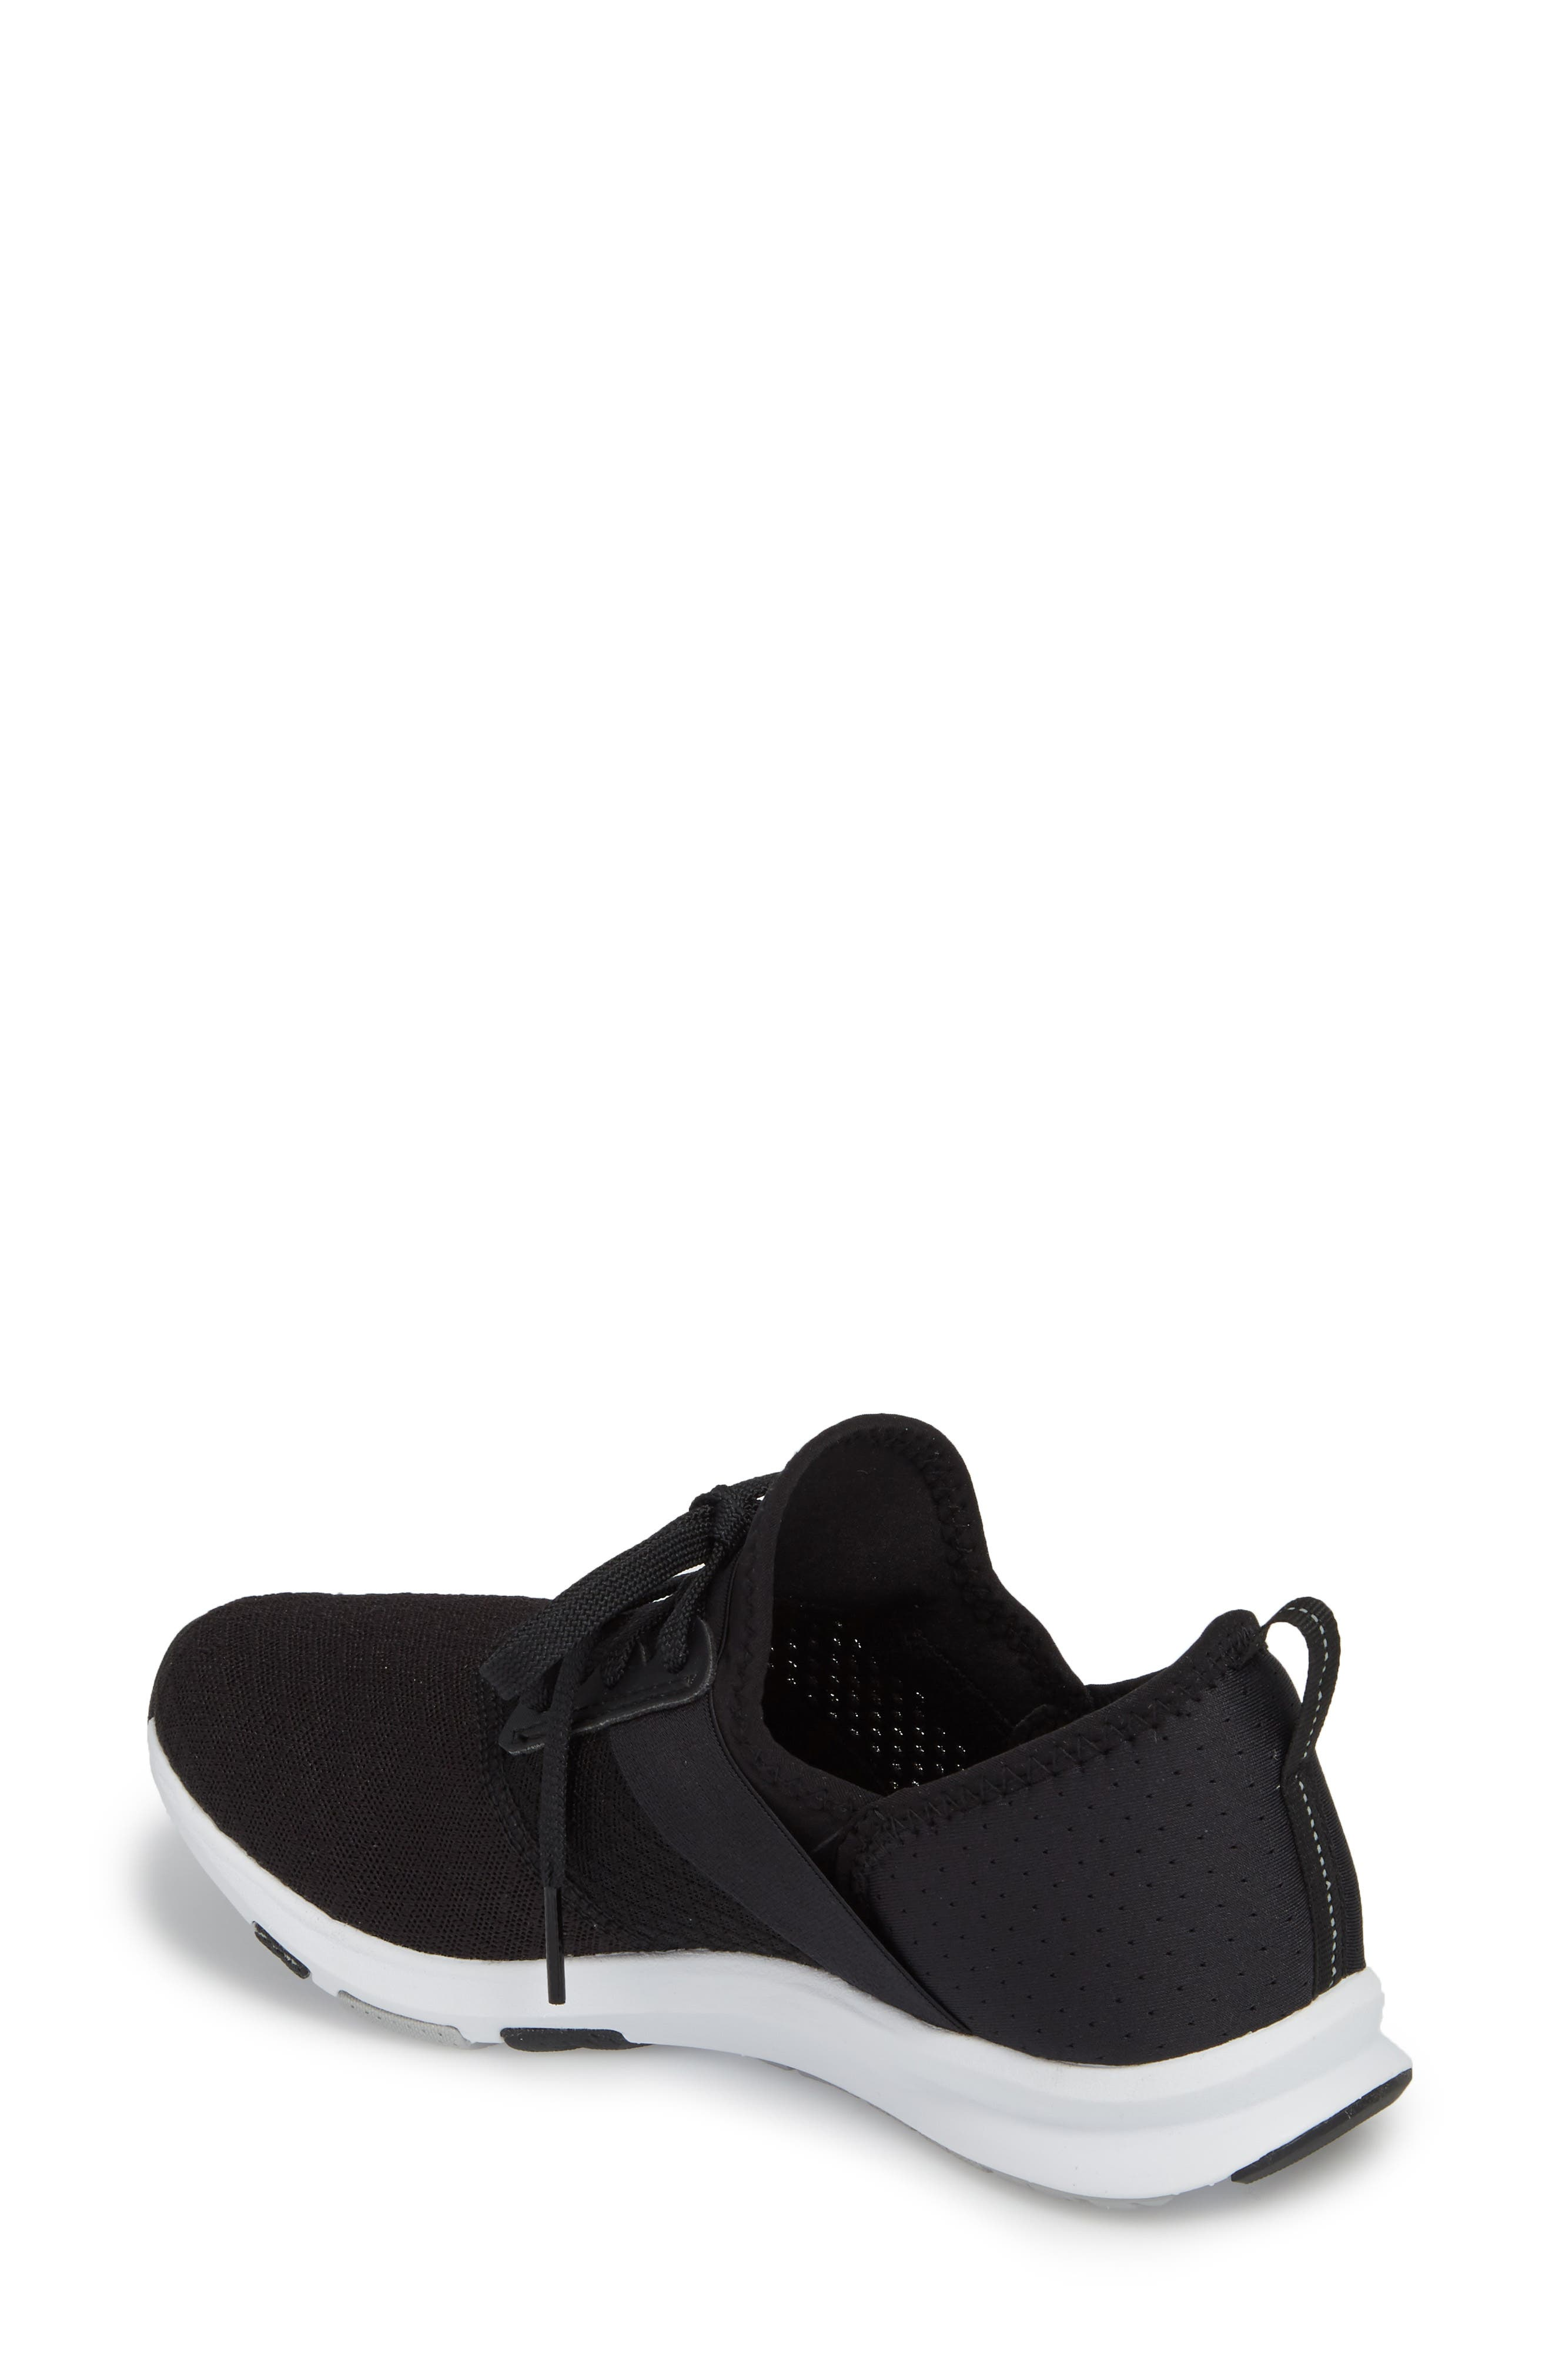 FuelCore NERGIZE Sneaker,                             Alternate thumbnail 2, color,                             BLACK